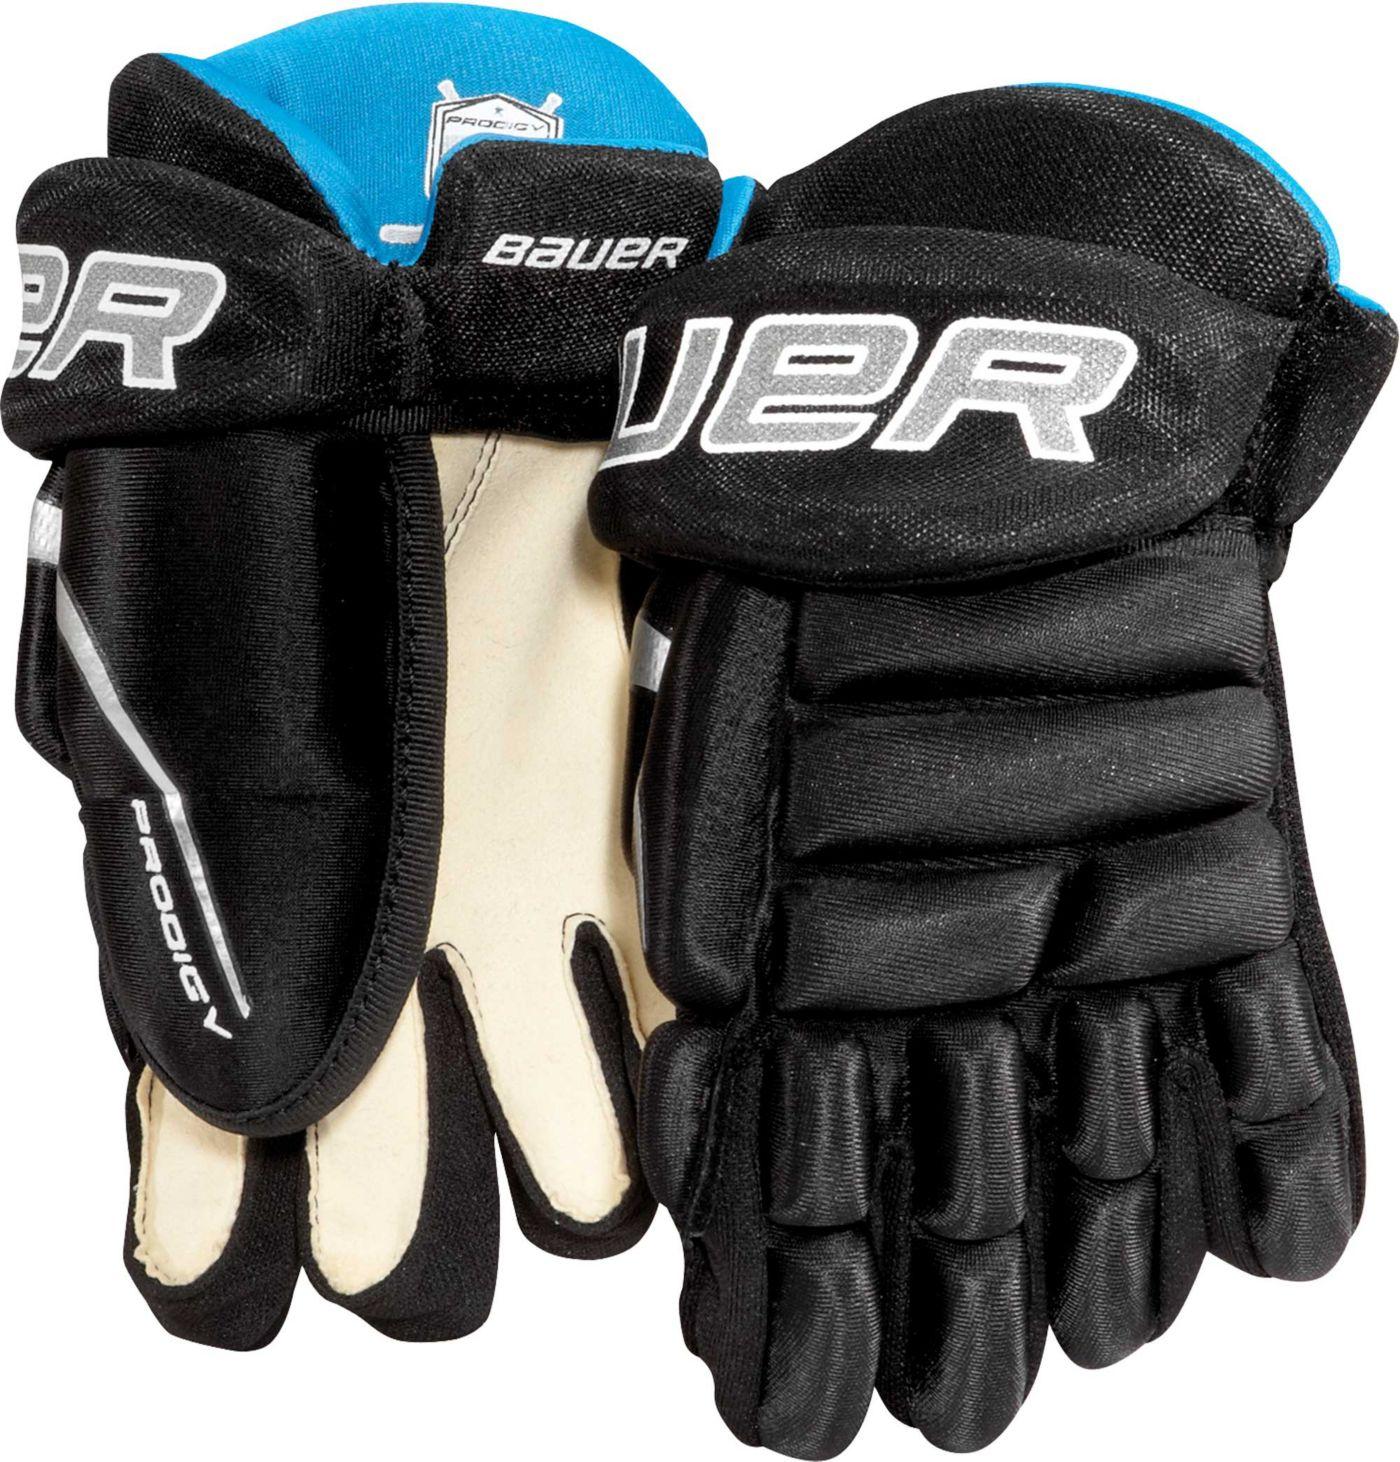 Bauer Youth Prodigy Ice Hockey Gloves